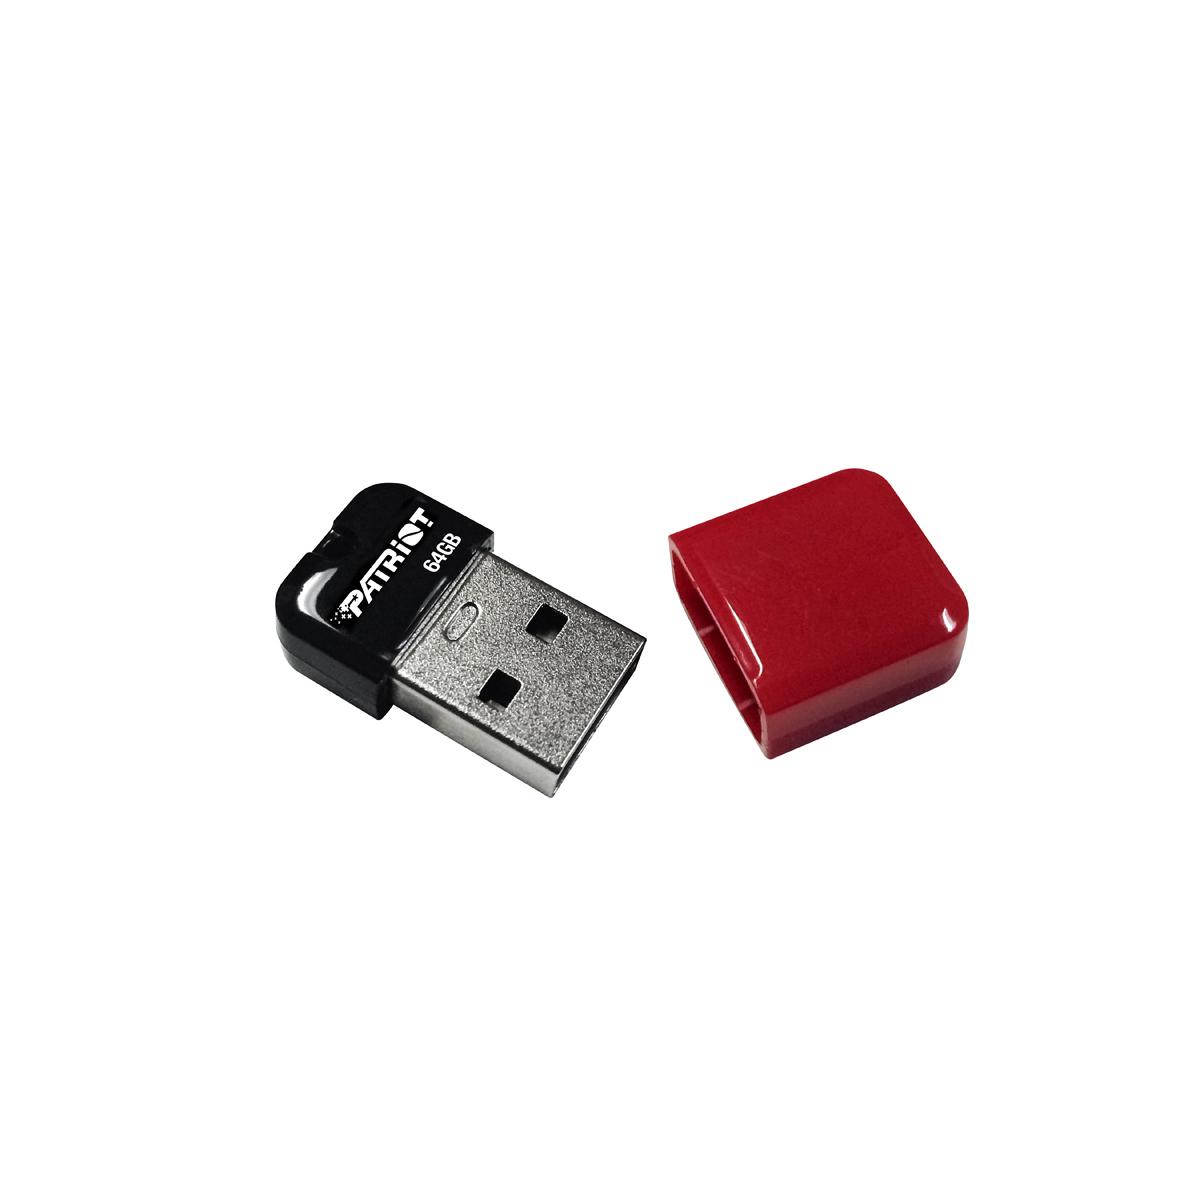 64GB Patriot Xporter Jibe USB 2.0 max. 20MB/s